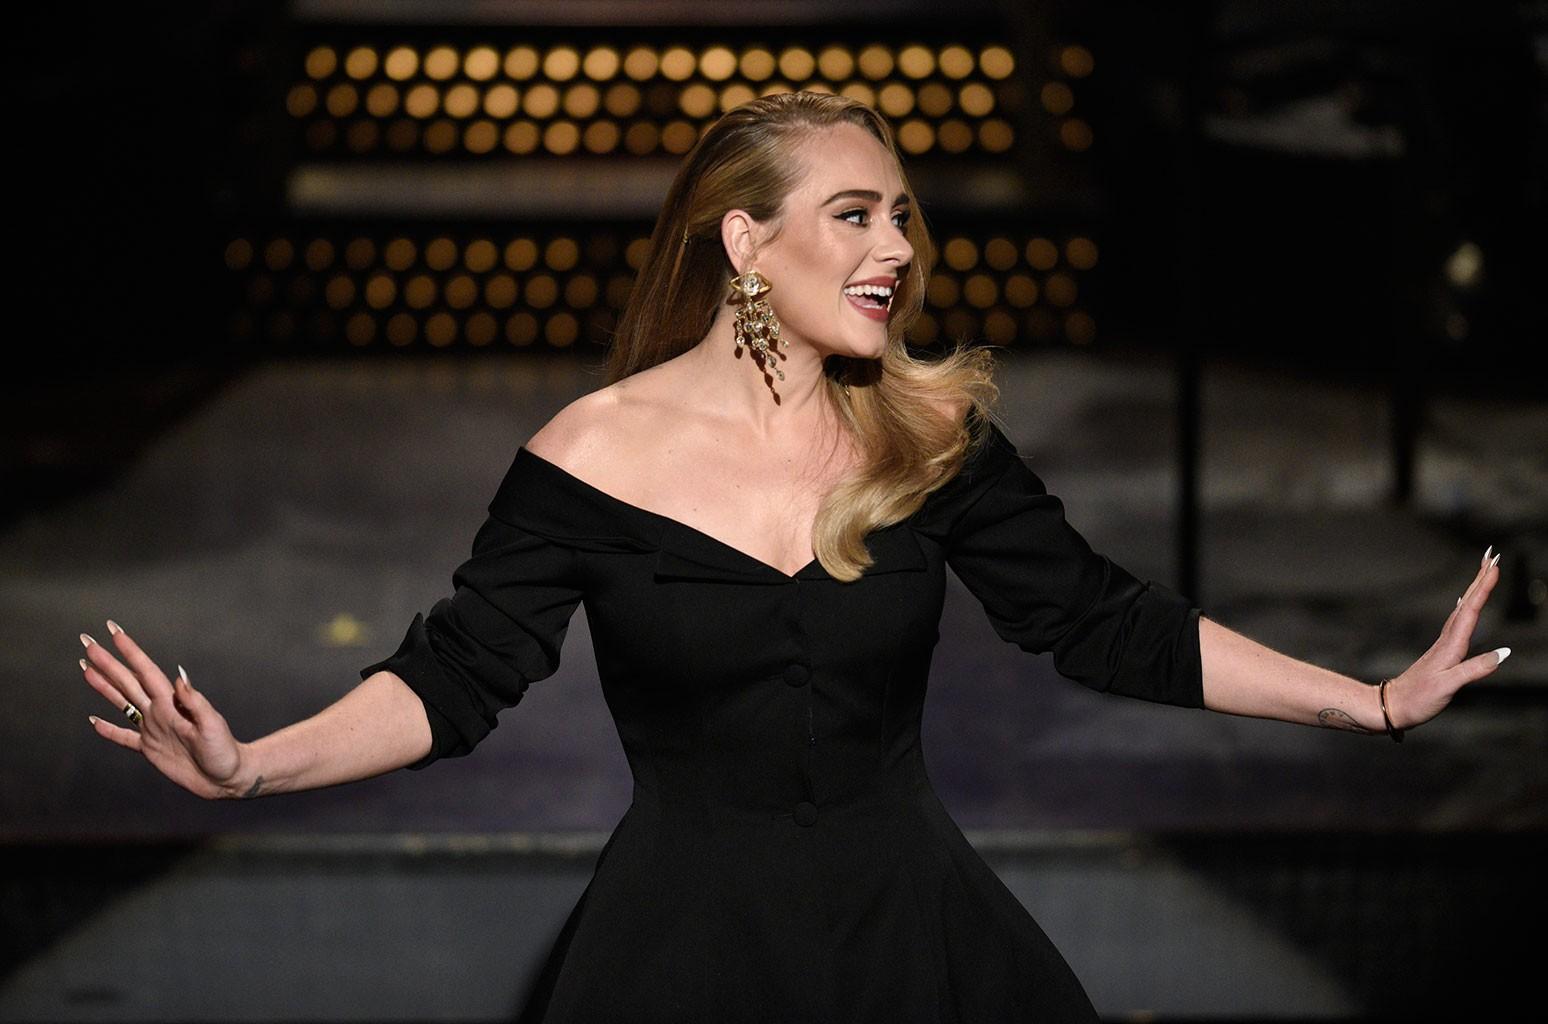 Adele Updates Social Media to Match '30' Billboards